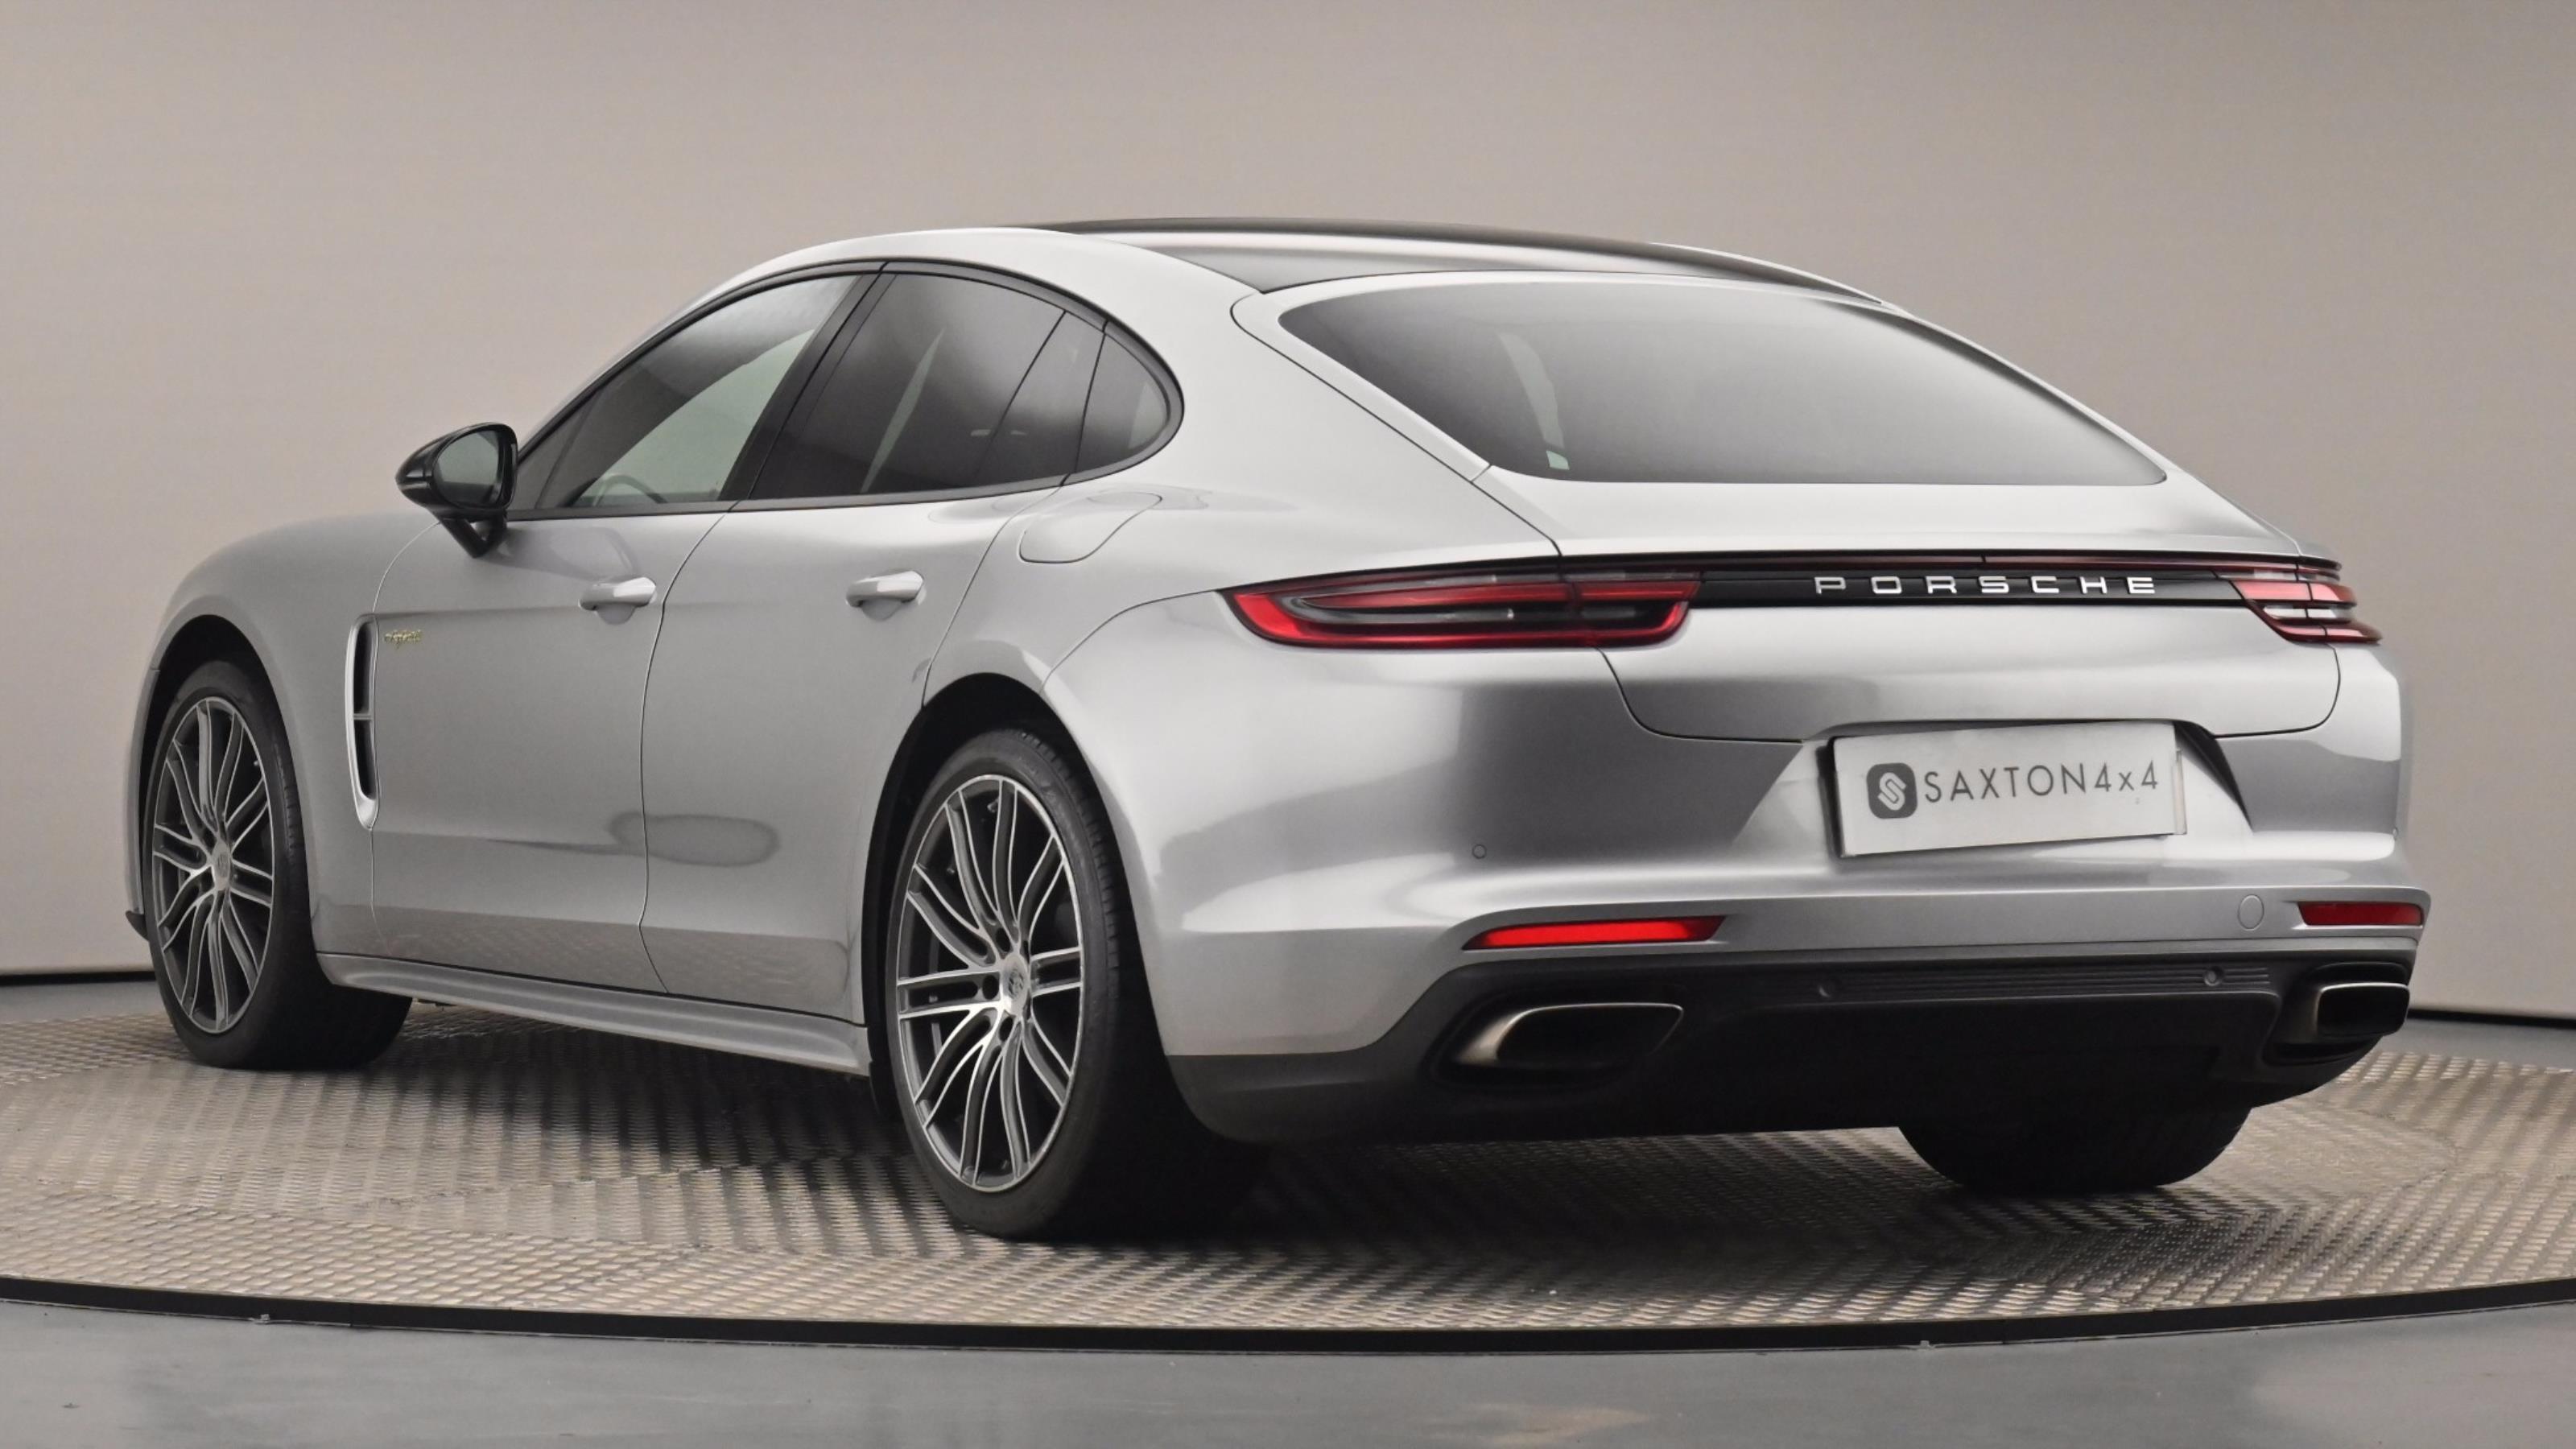 Used 2017 Porsche PANAMERA 2.9 V6 4 E-Hybrid 5dr PDK SILVER at Saxton4x4